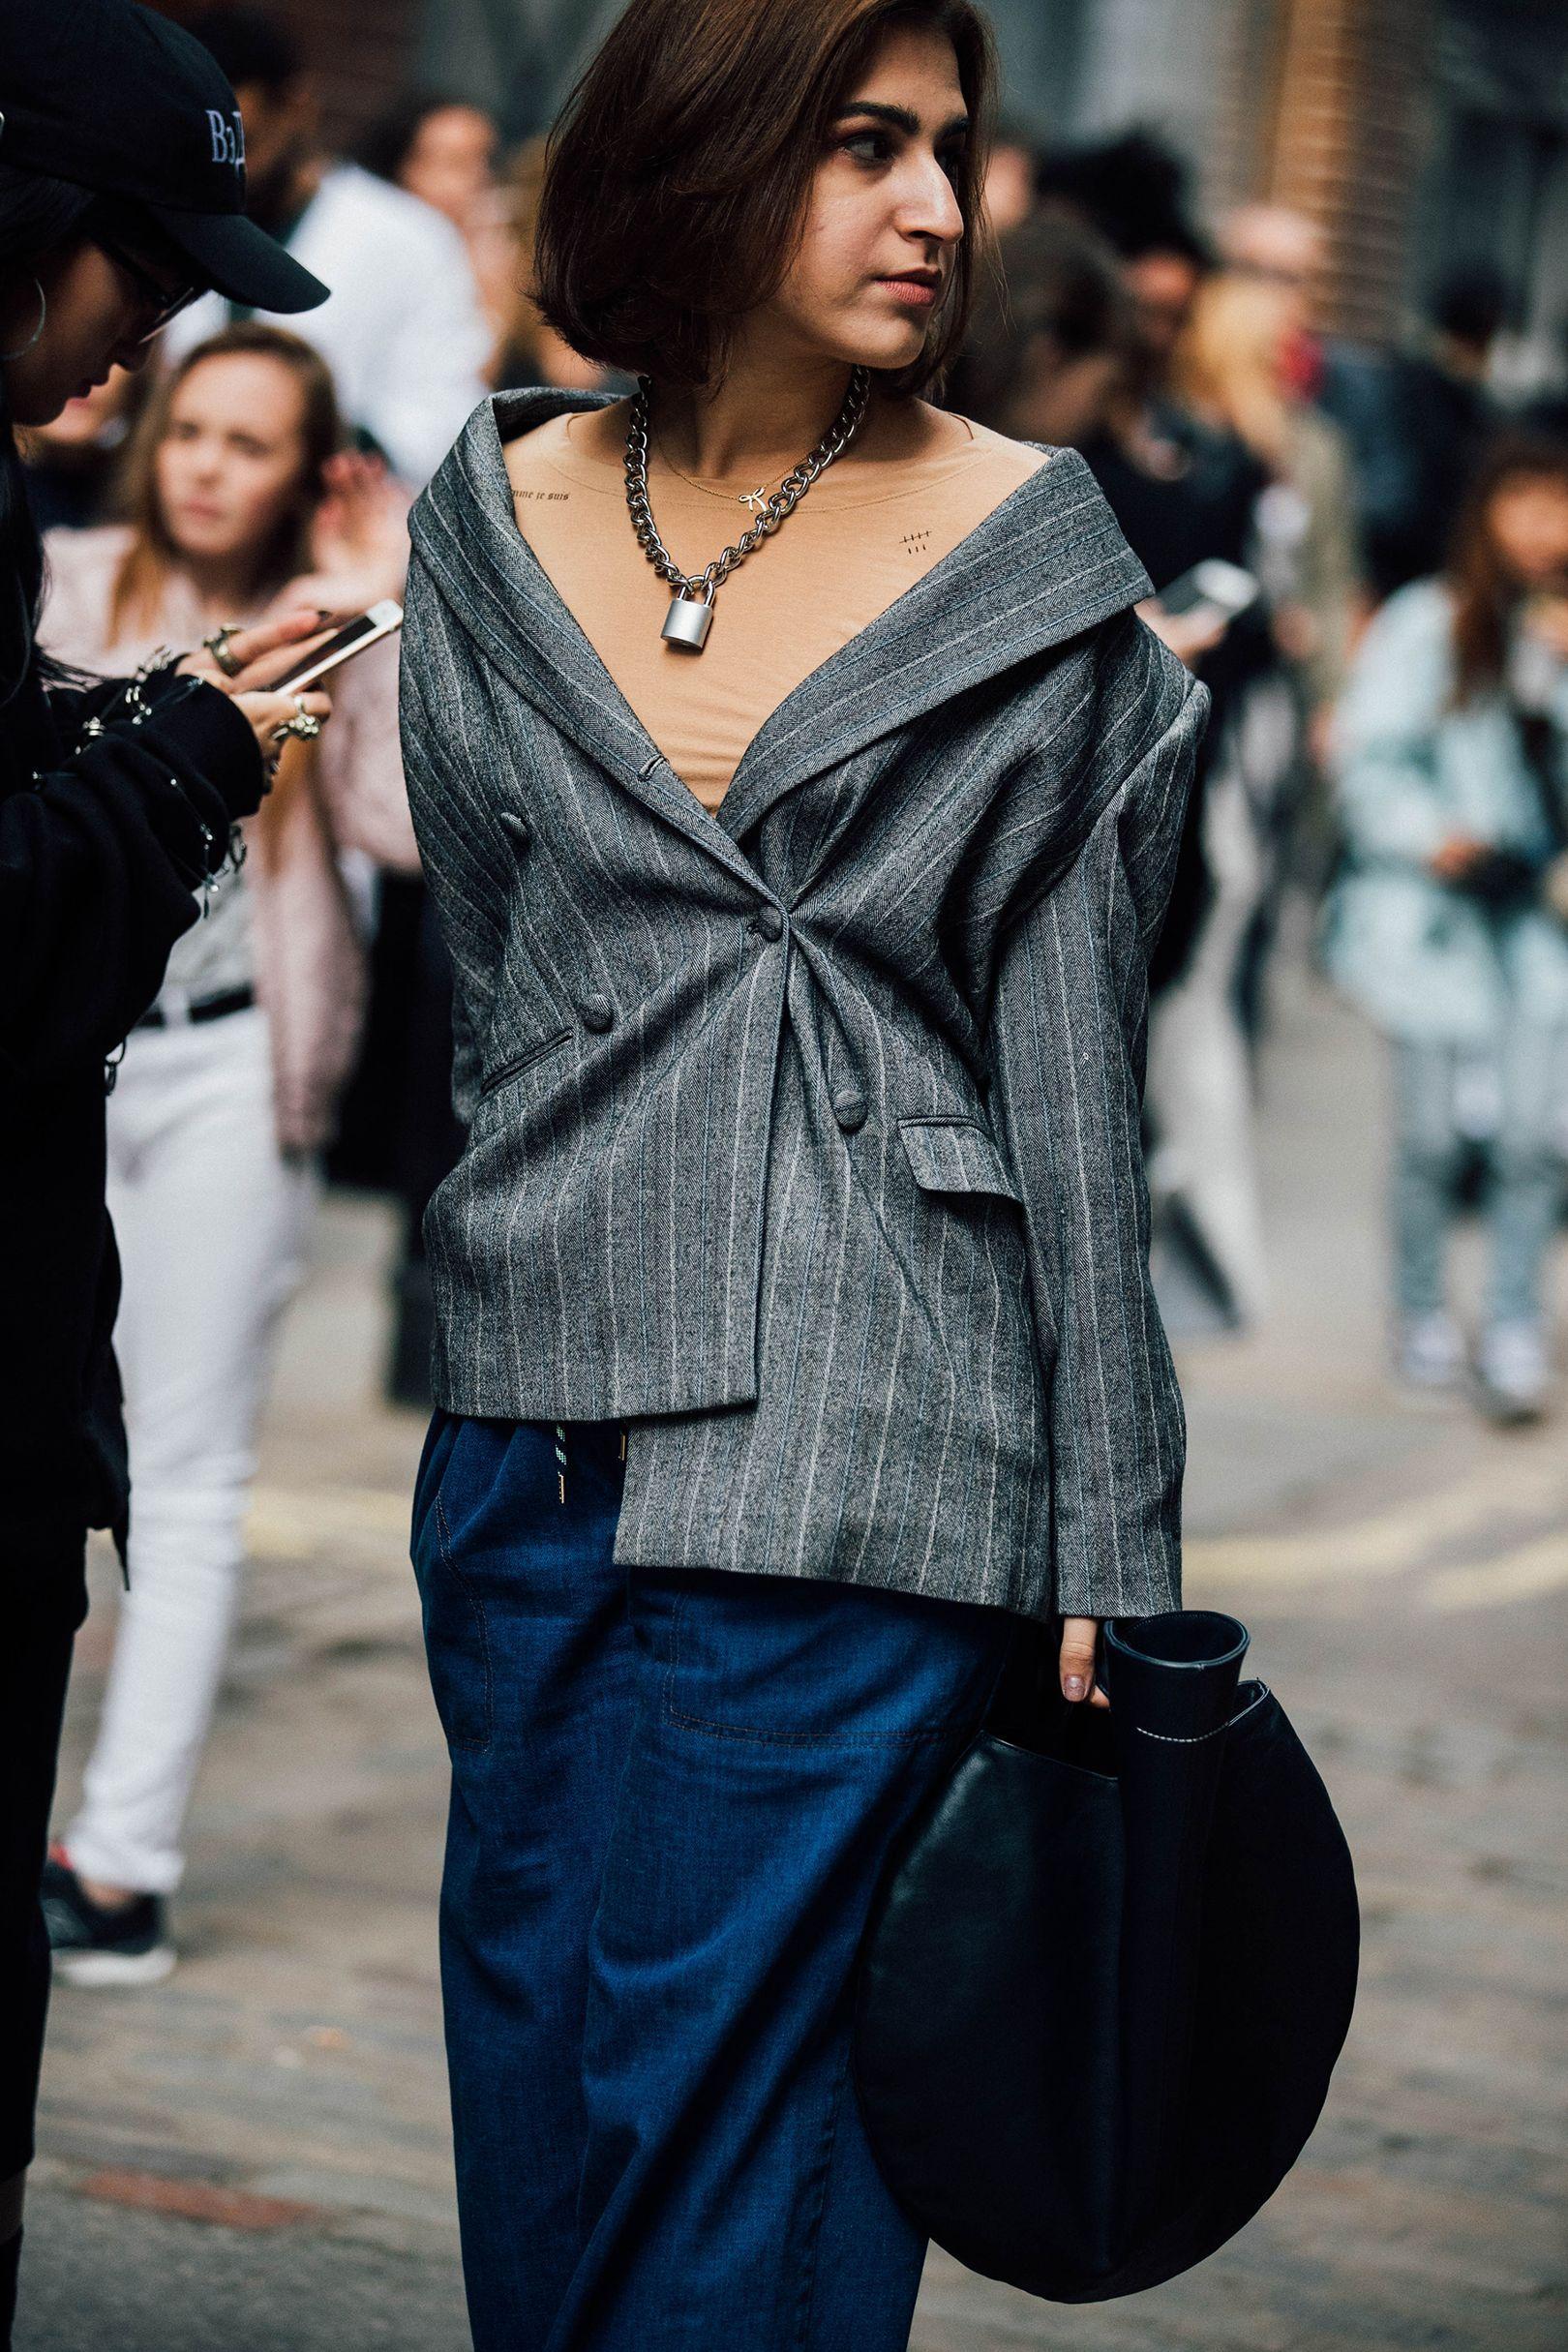 London Fashion Week Street Style Street Style Women London London Fashion Week Street Style High Fashion Street Style